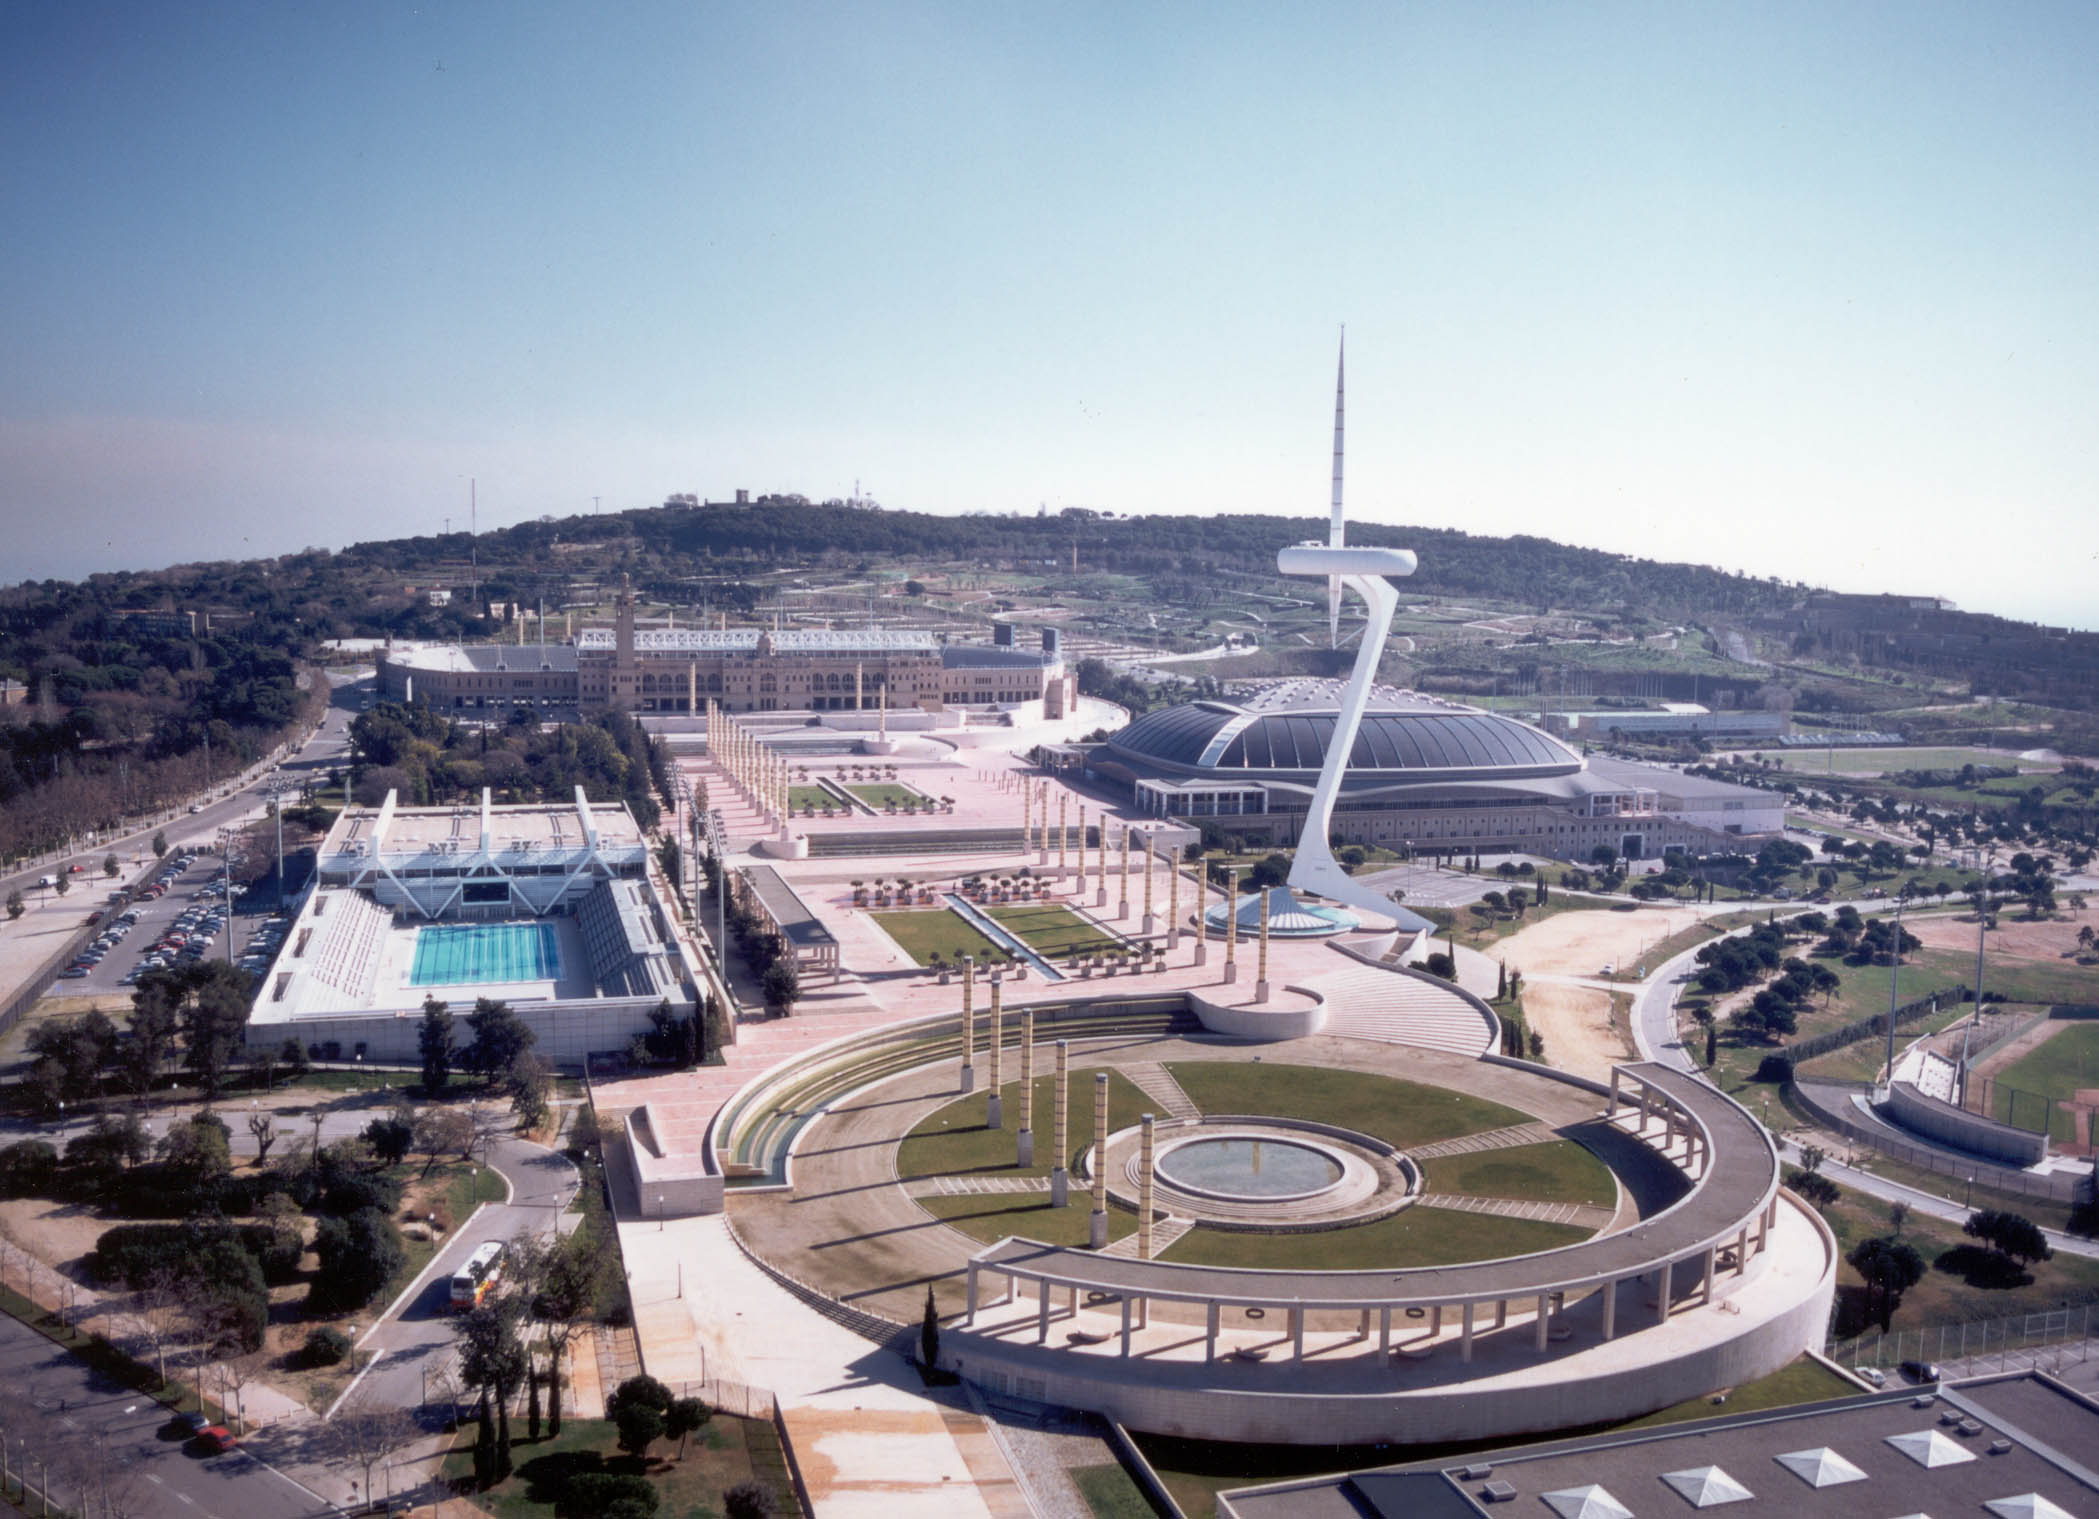 Parc olympique sport soci t - Piscine du stade olympique ...